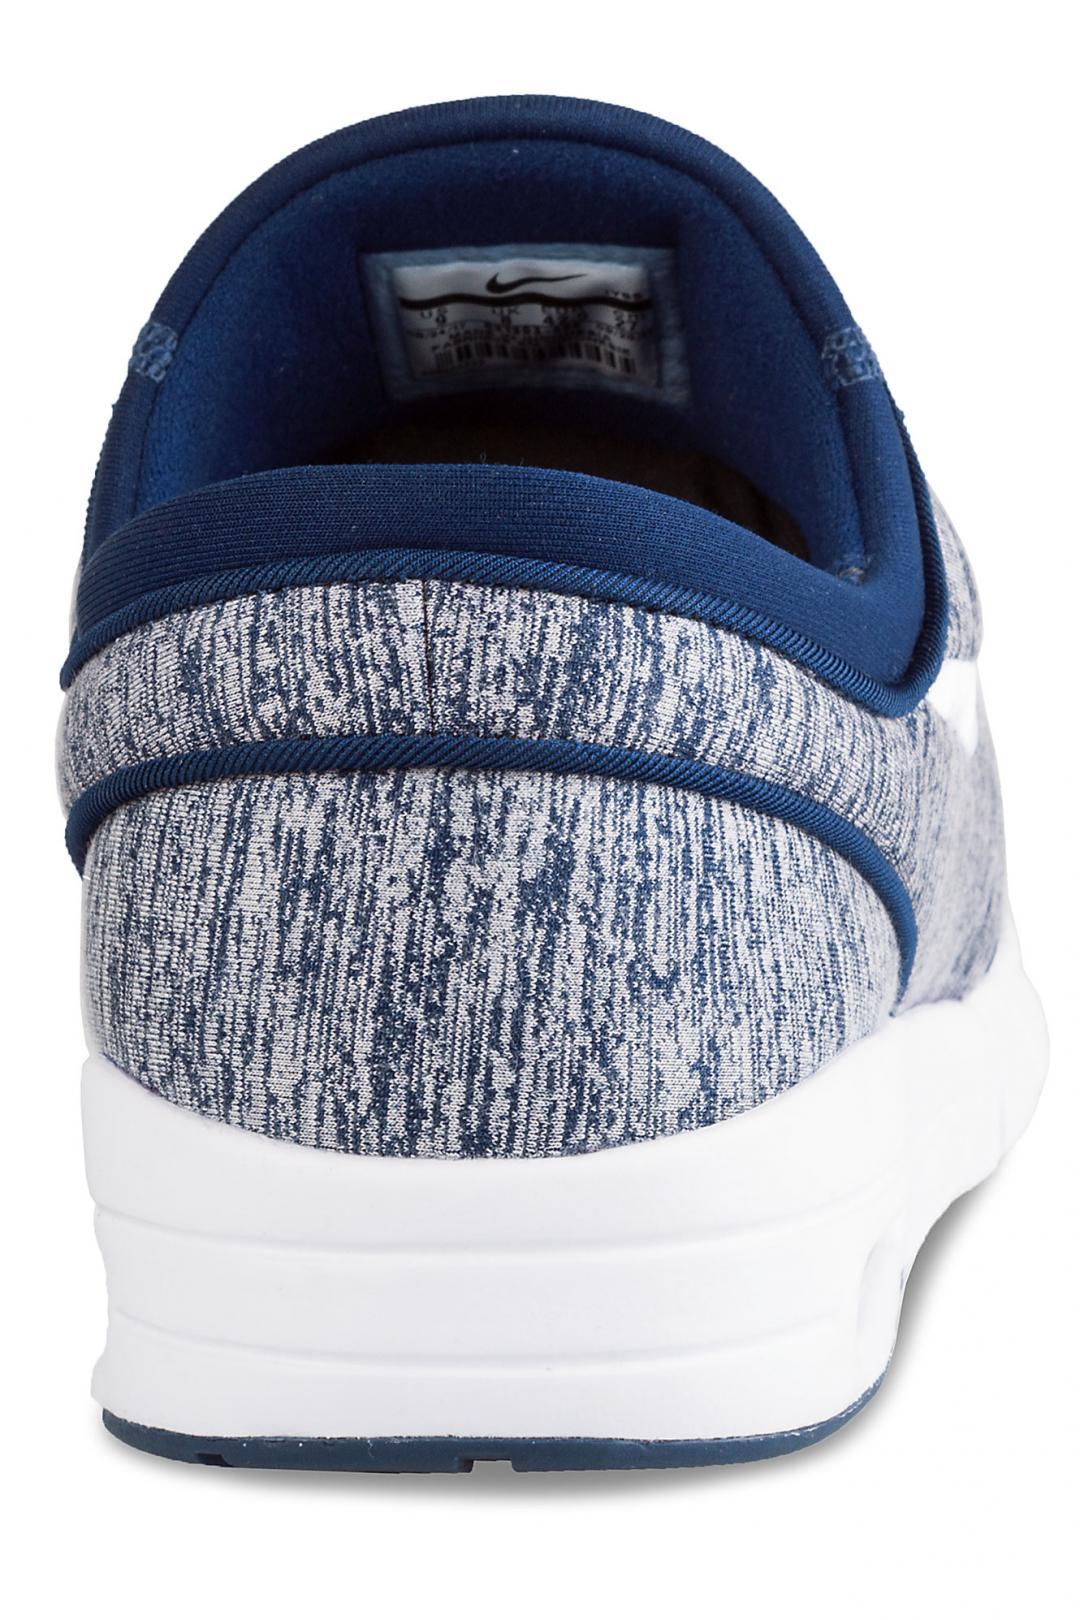 Uomo Nike SB Stefan Janoski Max blue void white   Sneaker